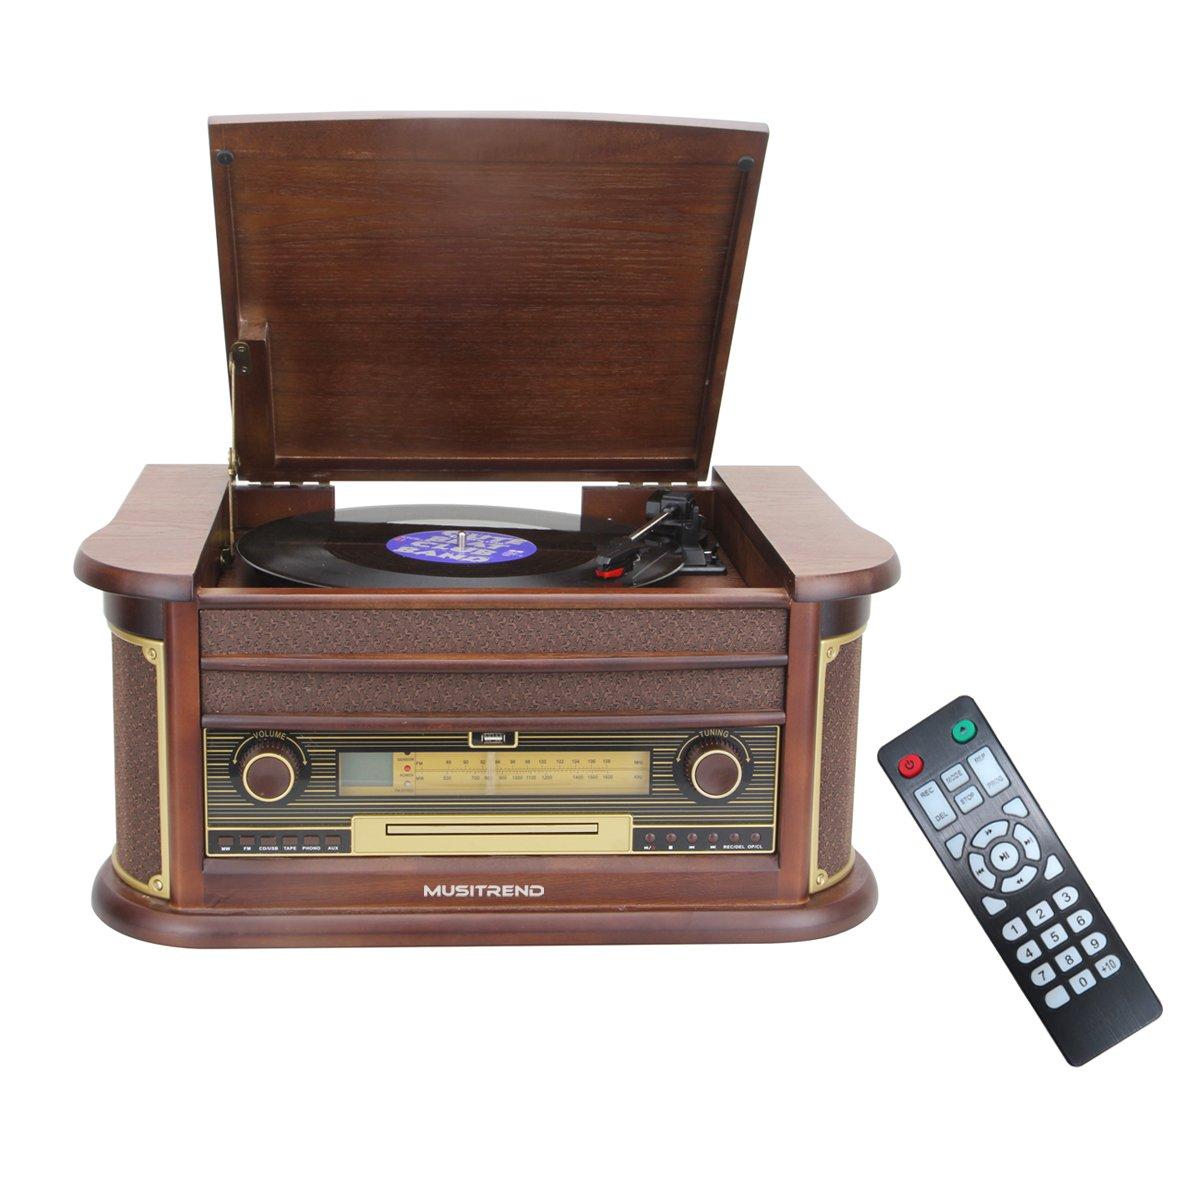 Amazon.com: musitrend Retro Vinyl Record Player 7-in-1 ...